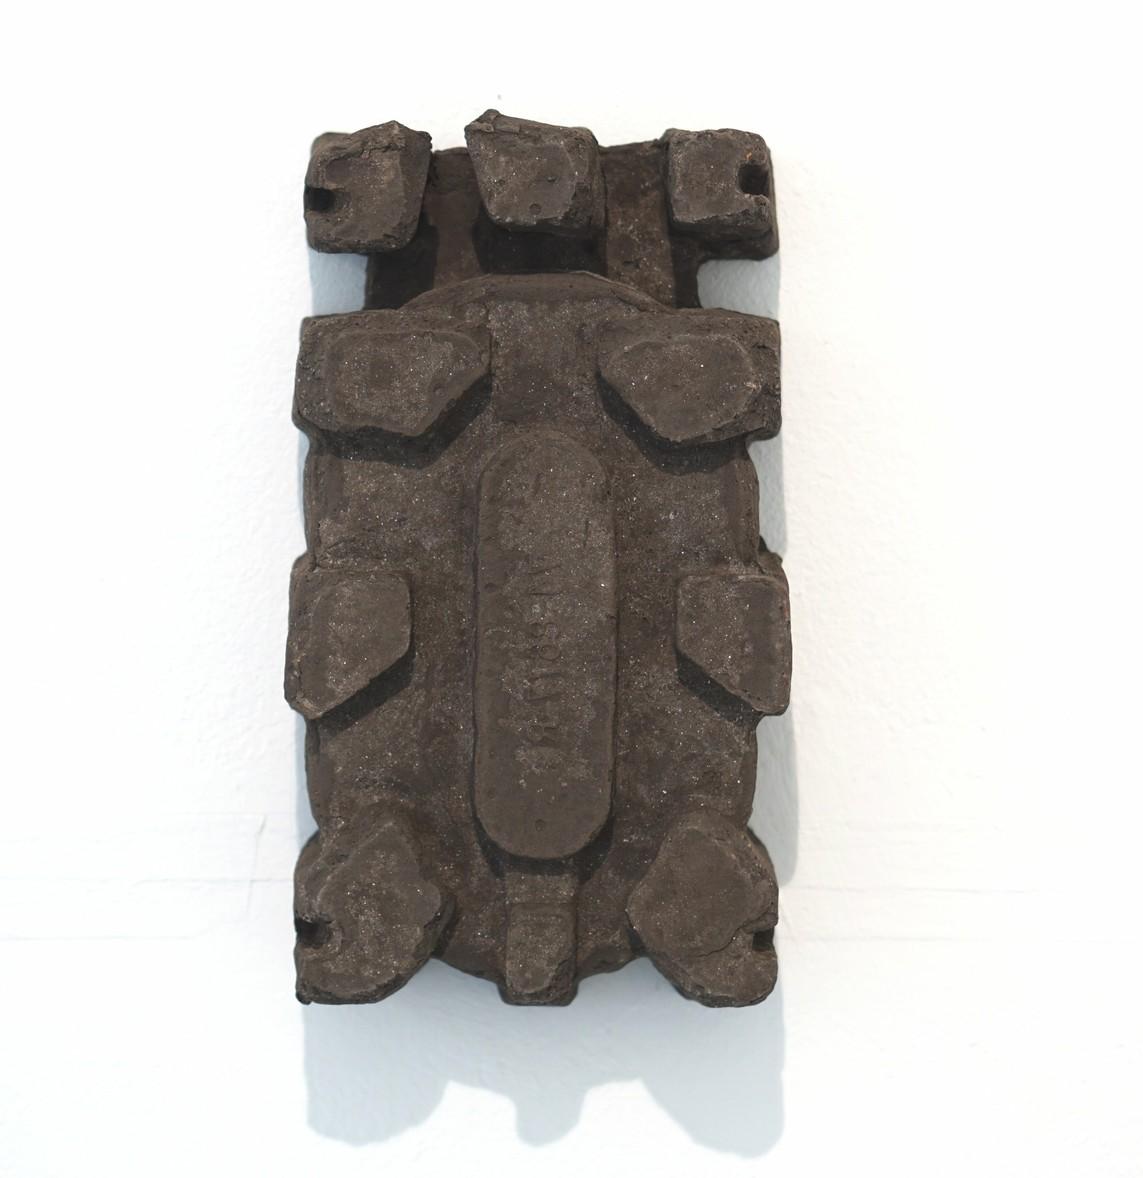 Umverpackung 12, 2018, Ton, Sprühbrand, 12 x 27 x 7 cm